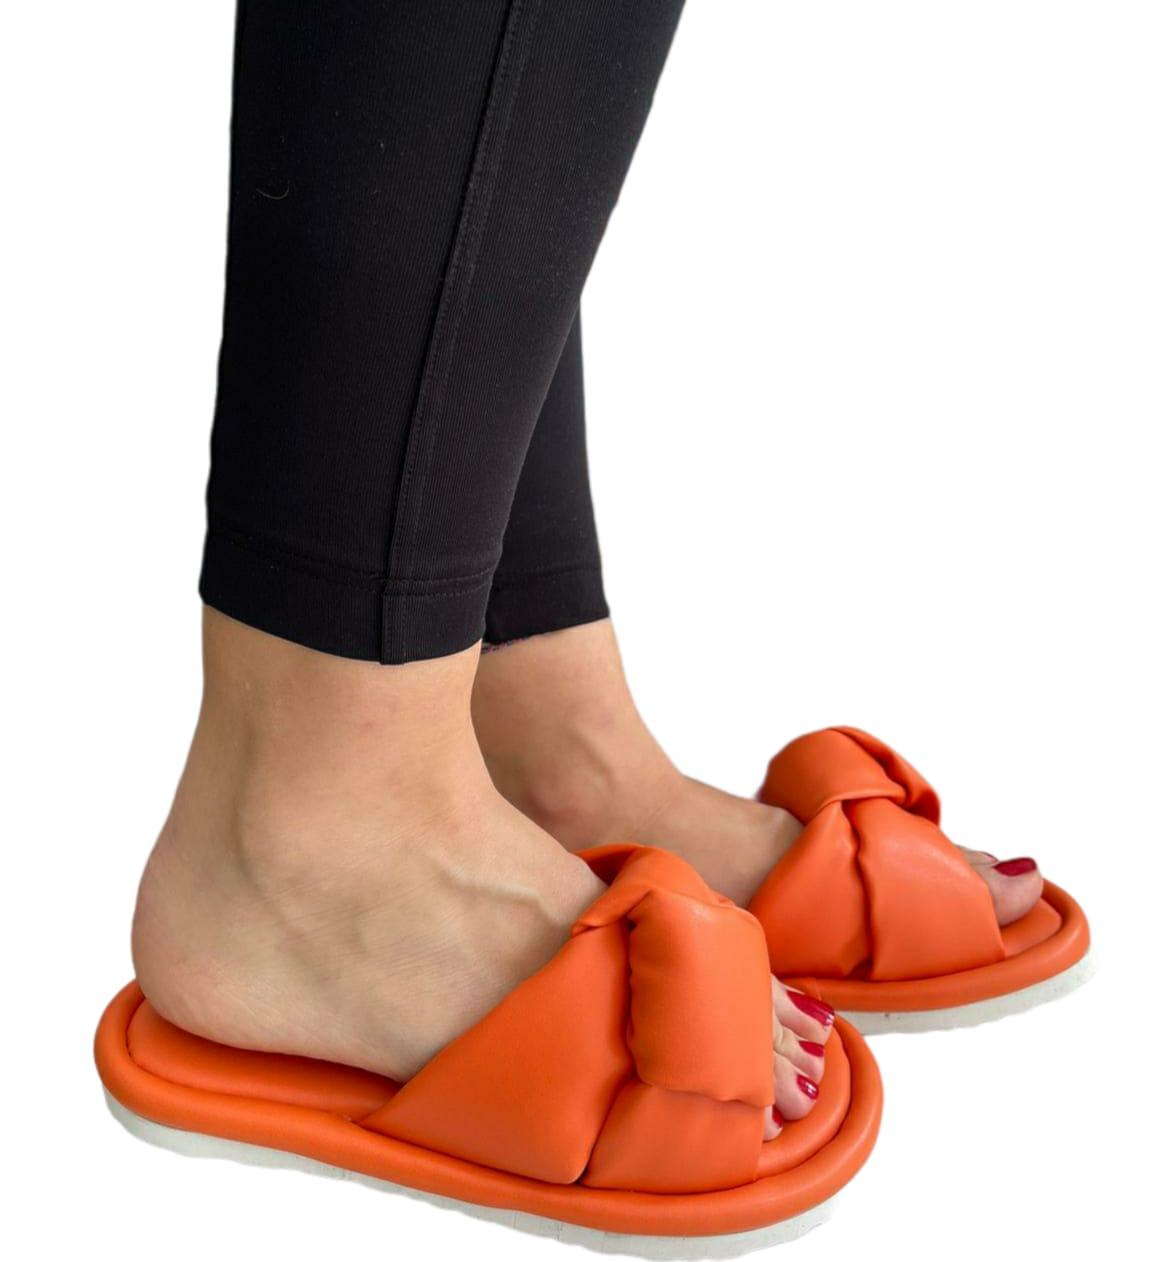 Шлёпанцы женские белый Оранжевый, 40